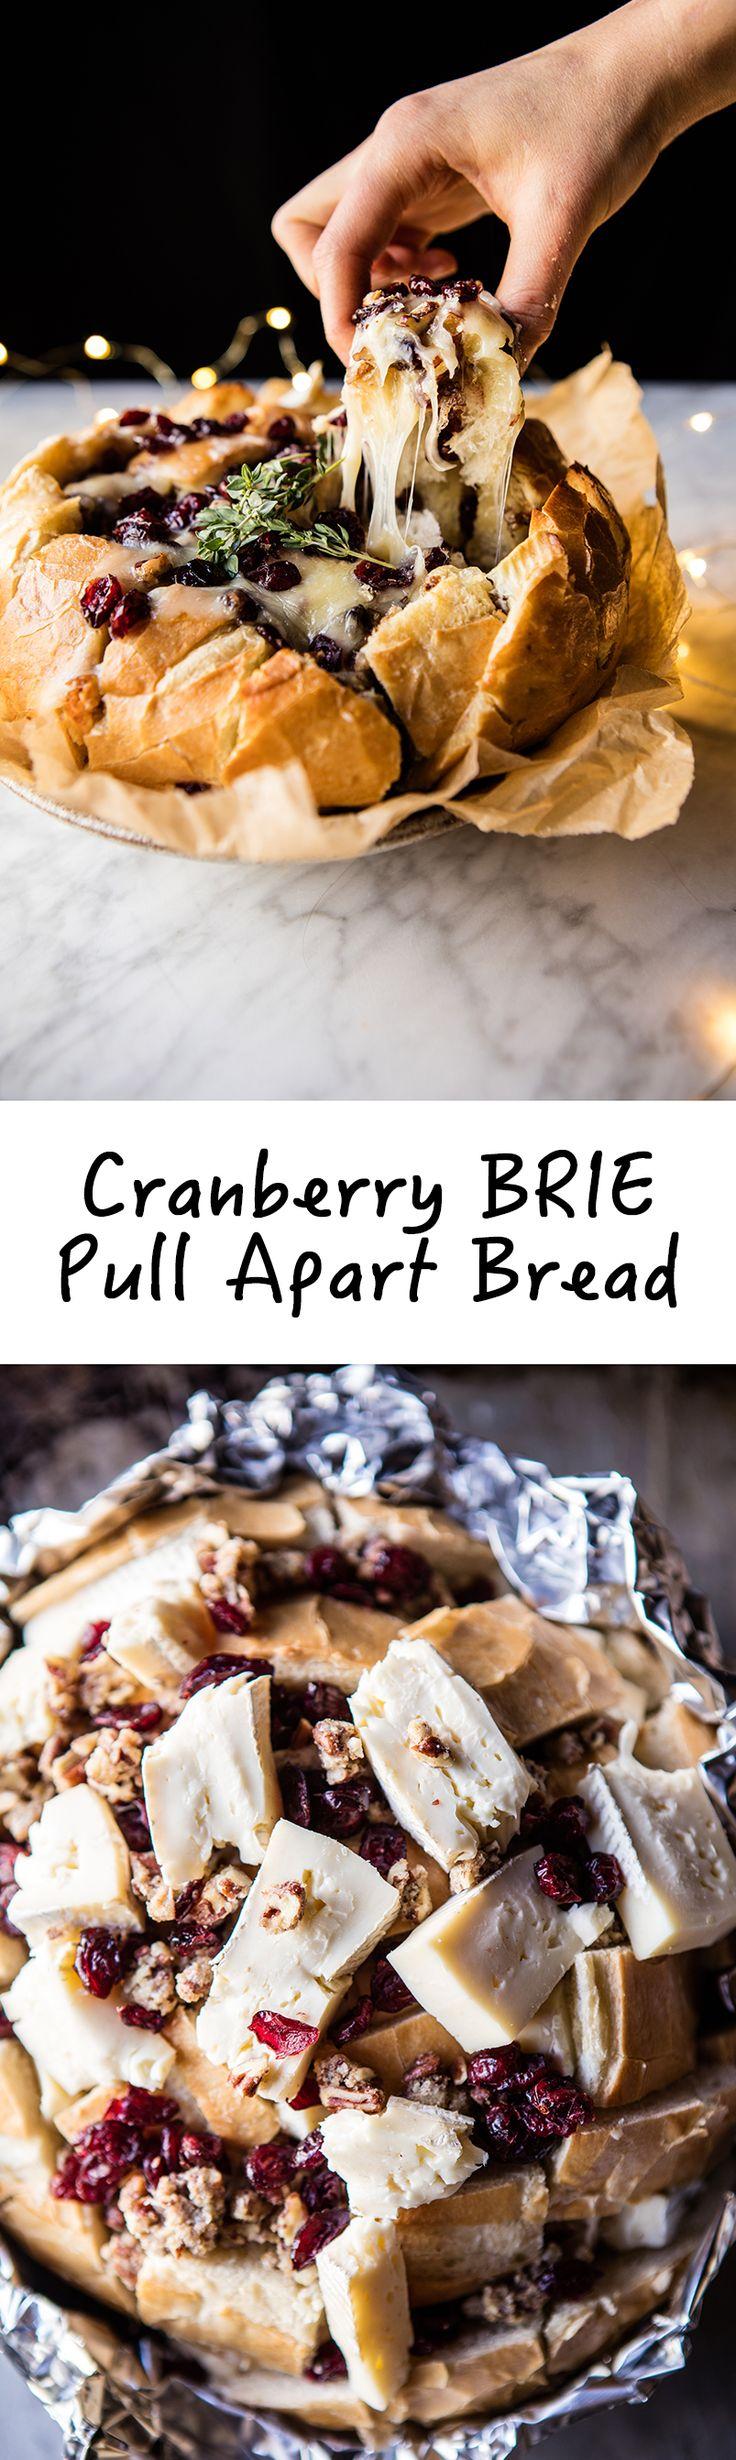 Cranberry Brie Pull Apart Bread   halfbakedharvest.com @hbharvest